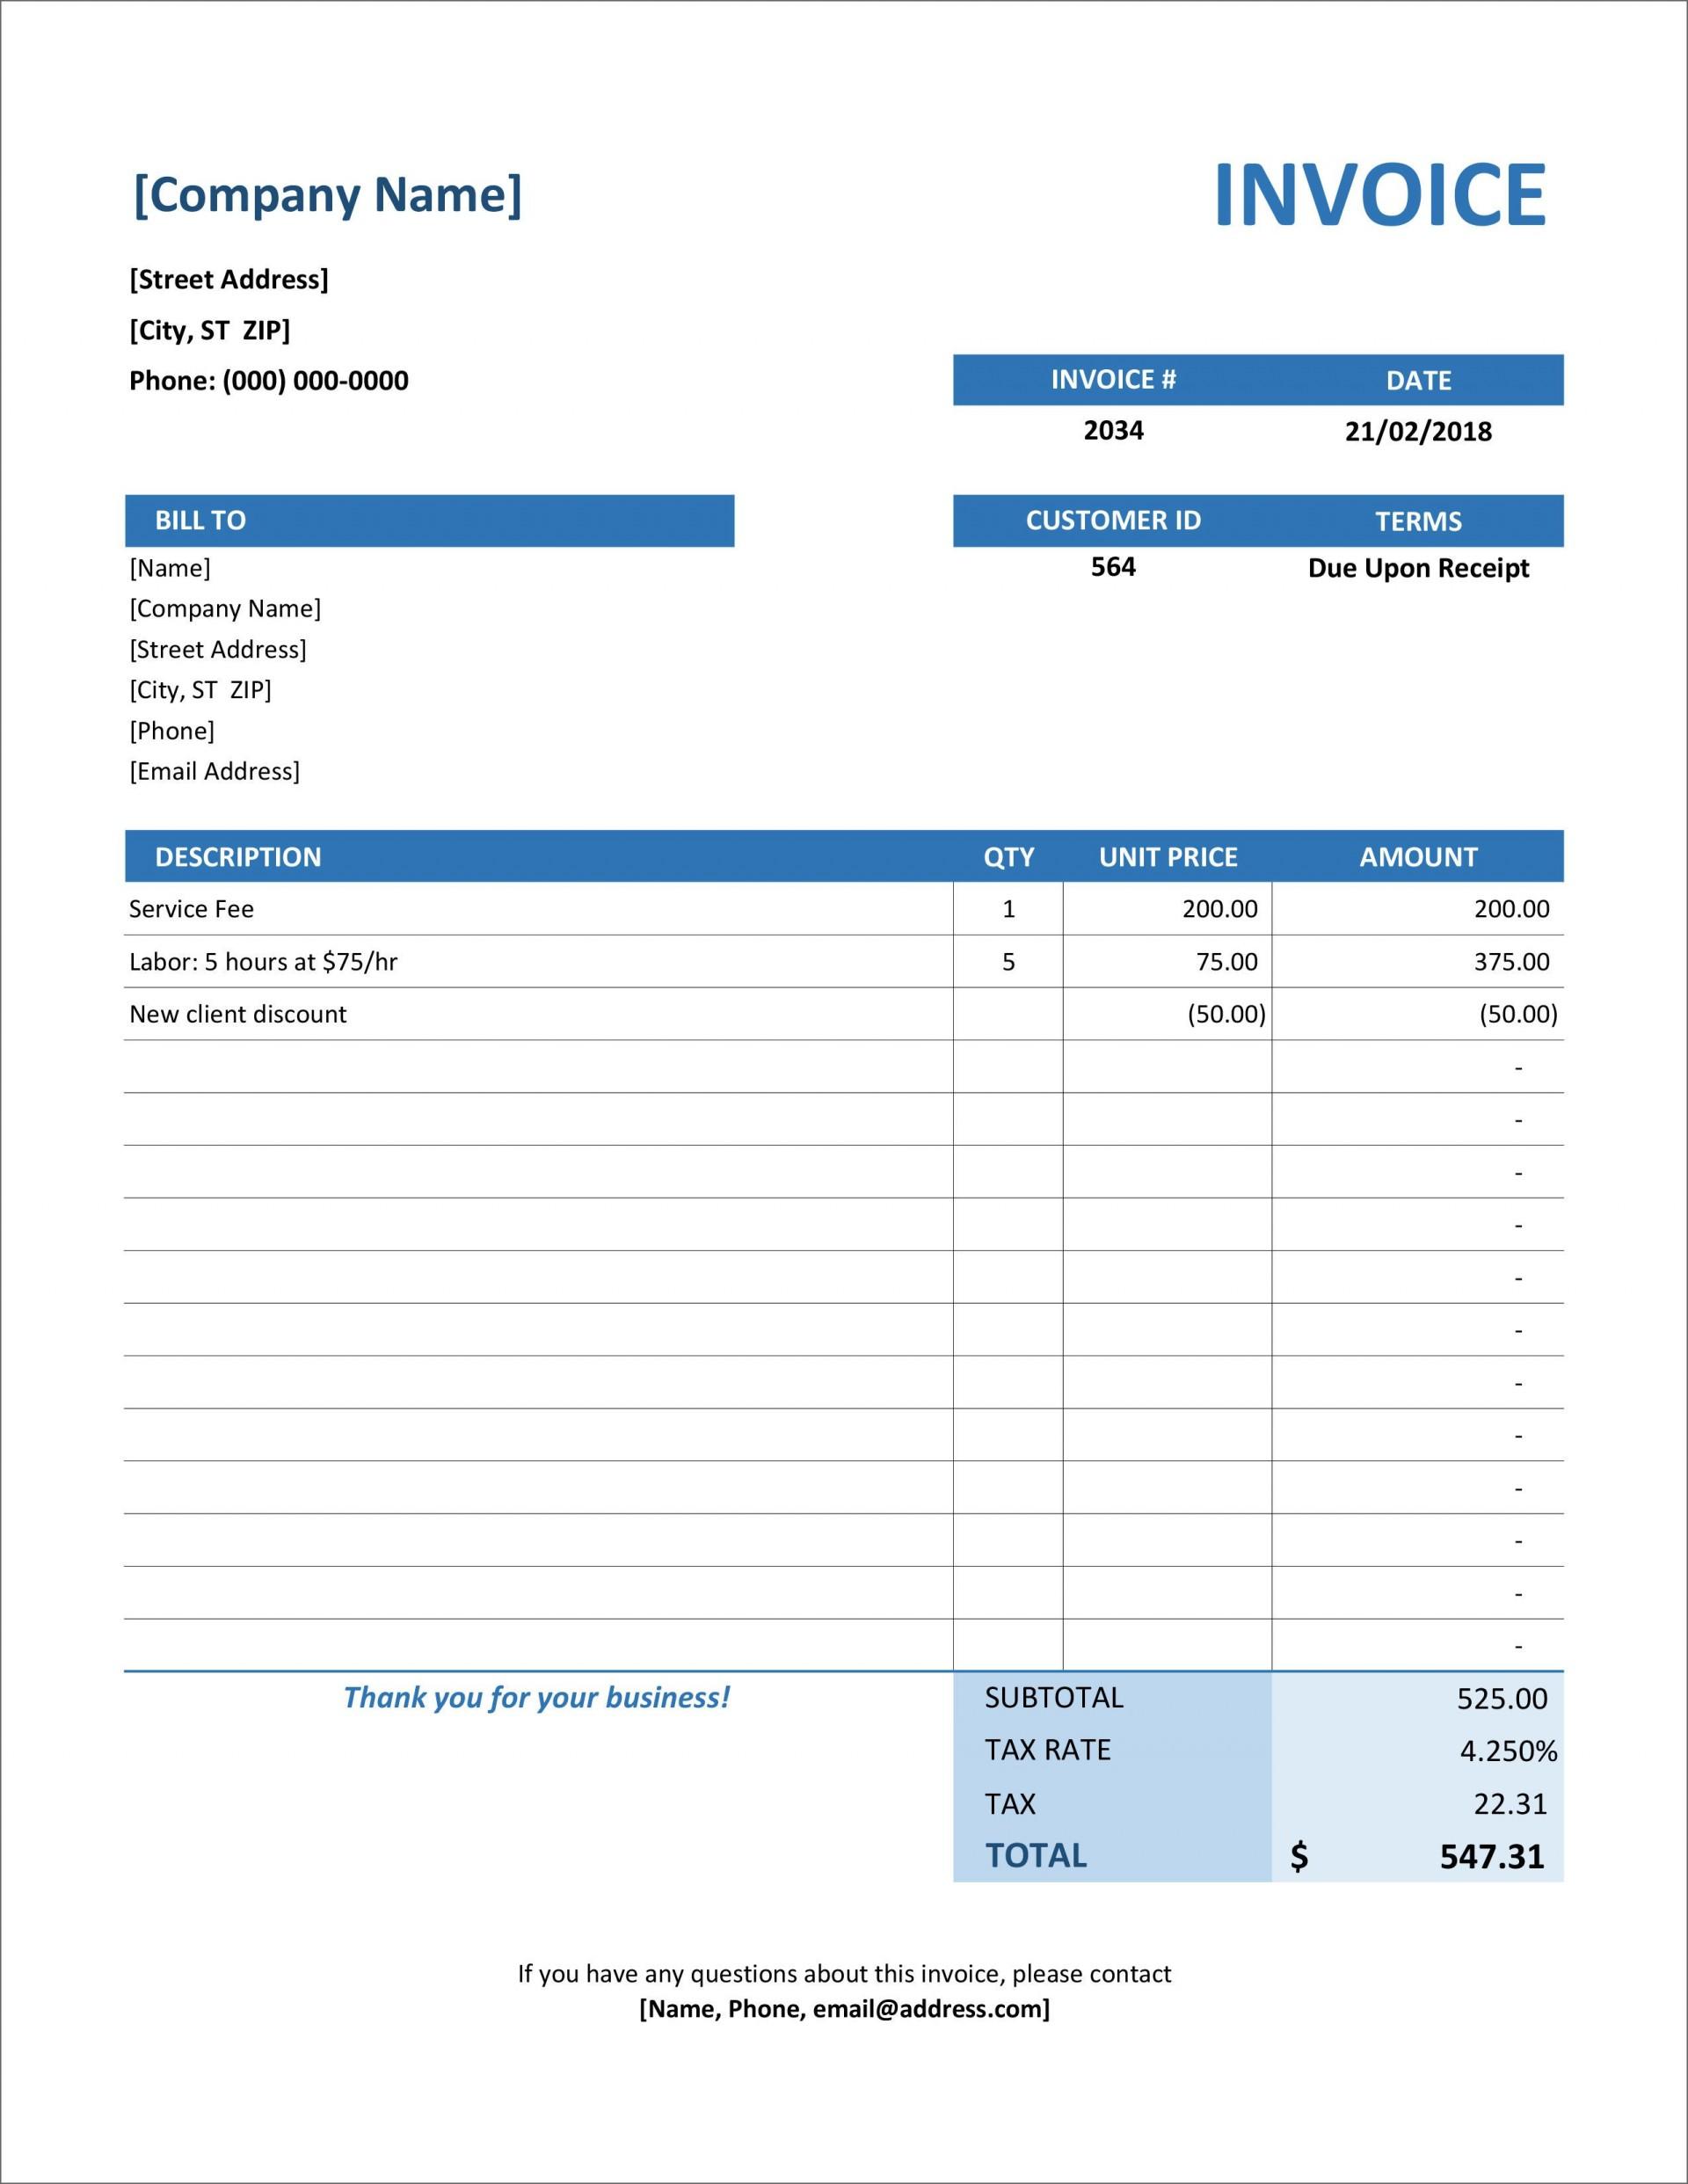 005 Simple Sample Tax Invoice Excel Download Idea 1920